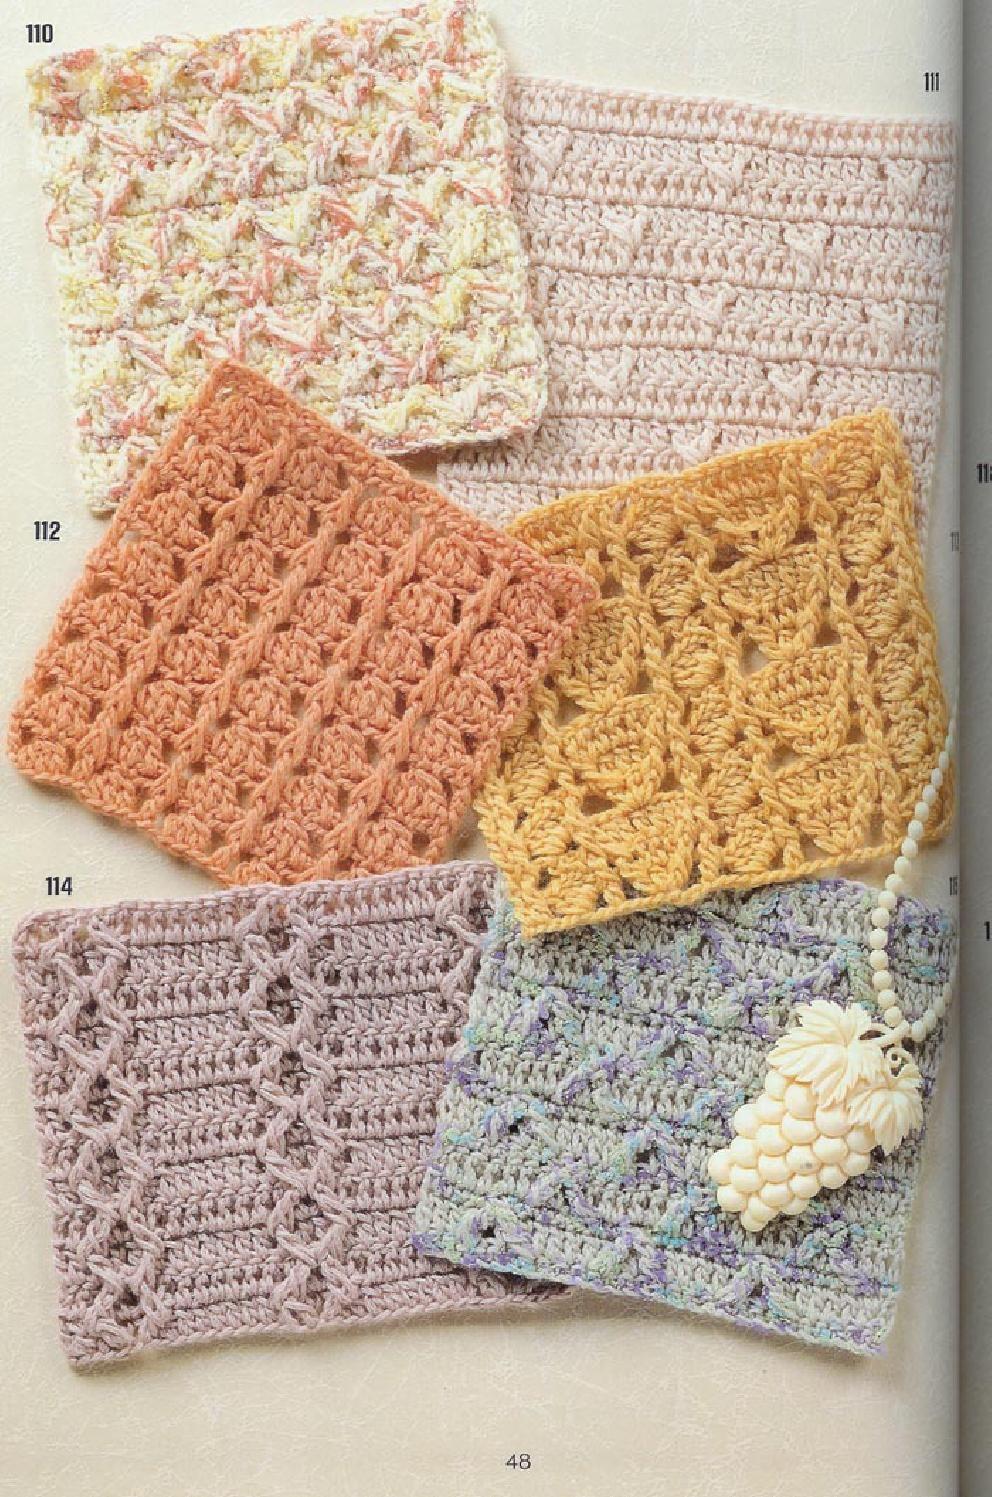 262 patrones crochet   Patrones, Crochet and Crochet stitches